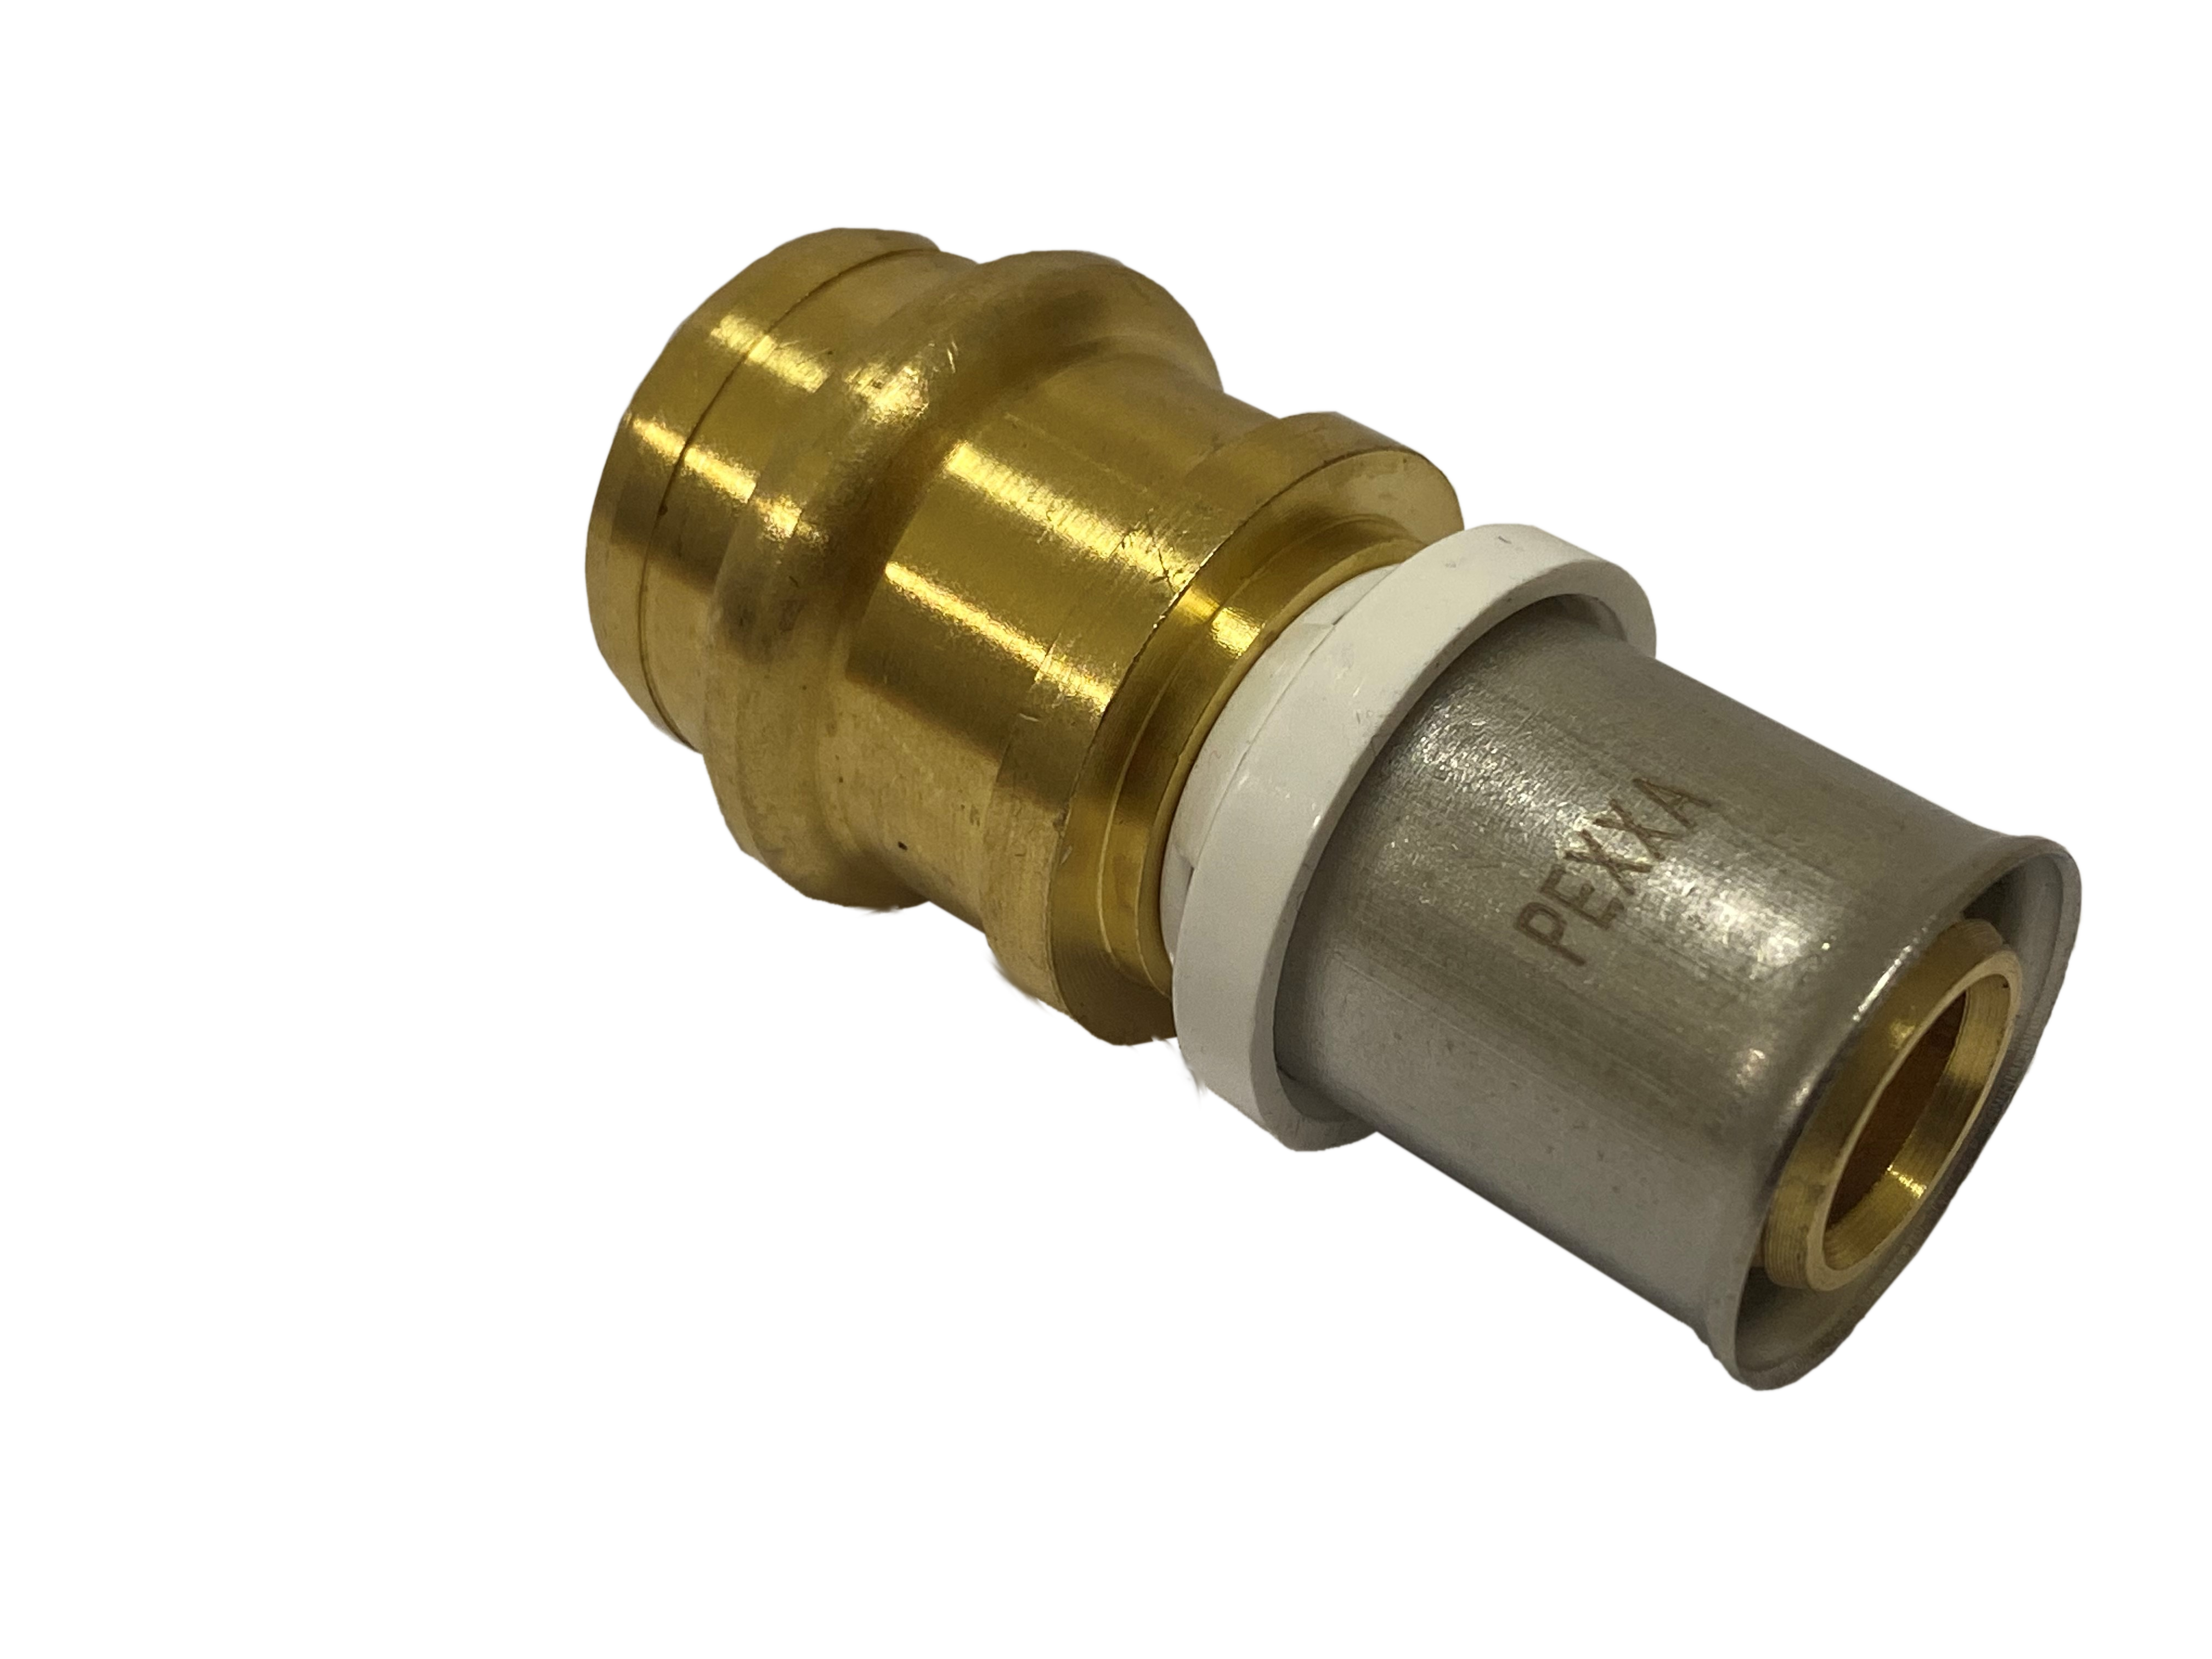 Adapteur PEXXA à sertir Cuivre EAU 20x22 profil-V